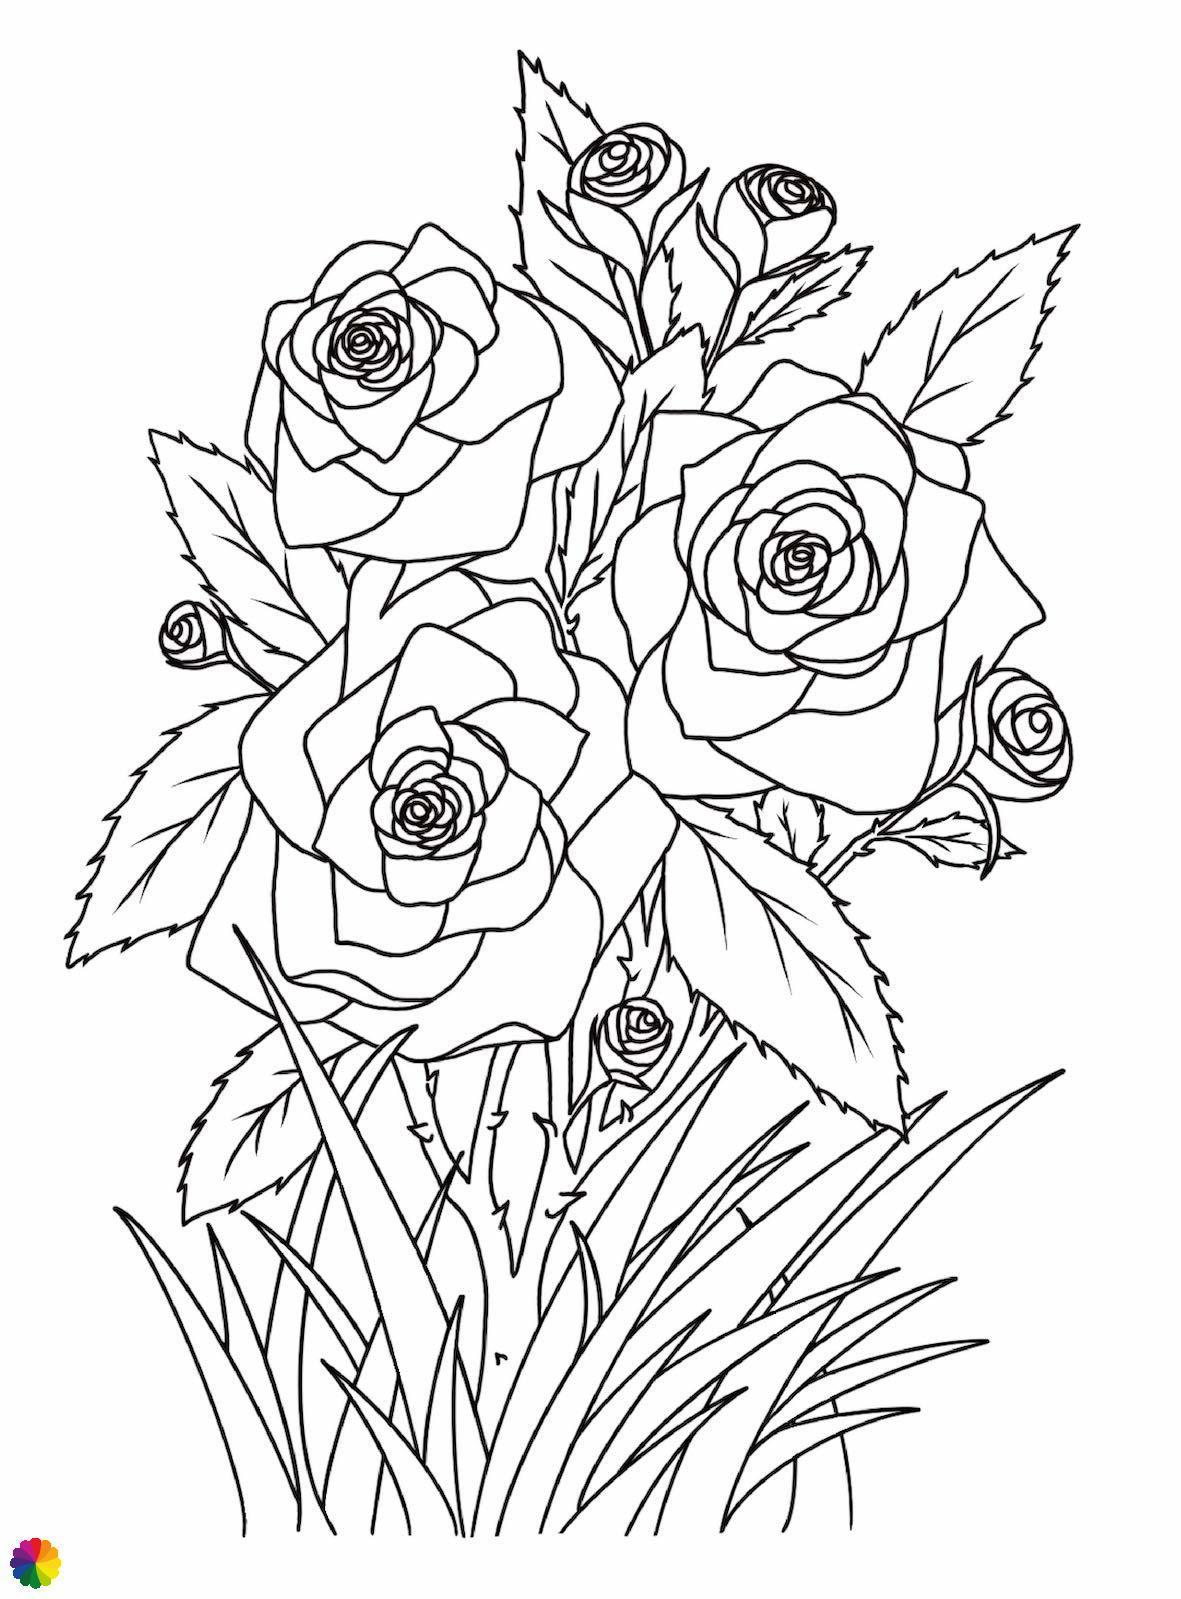 Rozen tattoo-ontwerp